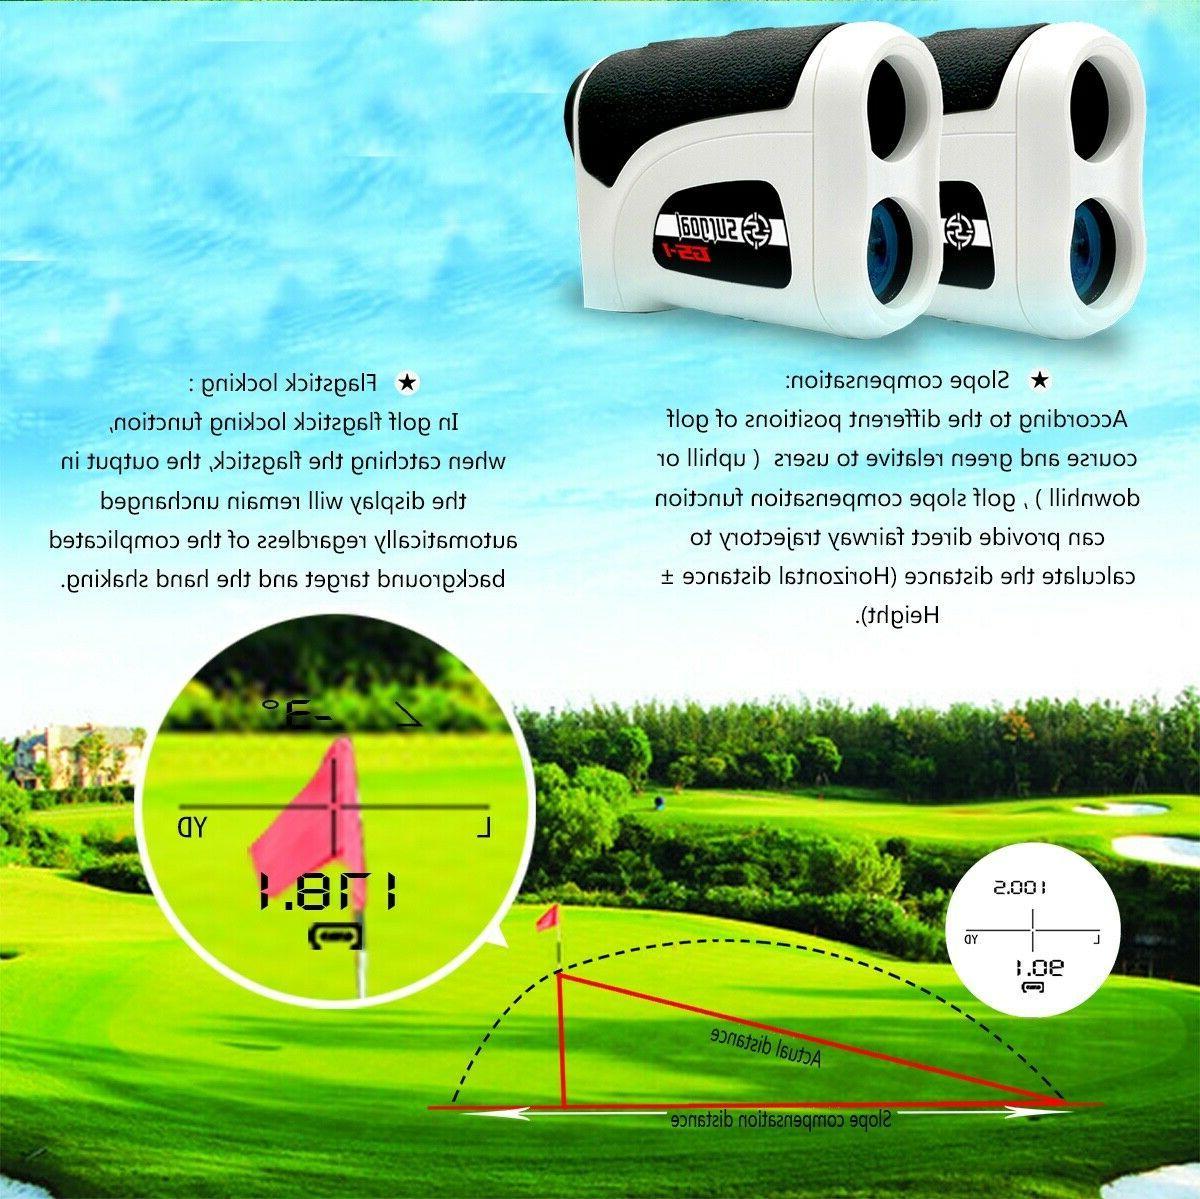 Surgoal HD Mag. Laser with Slope/Flag-Lock/Vibration